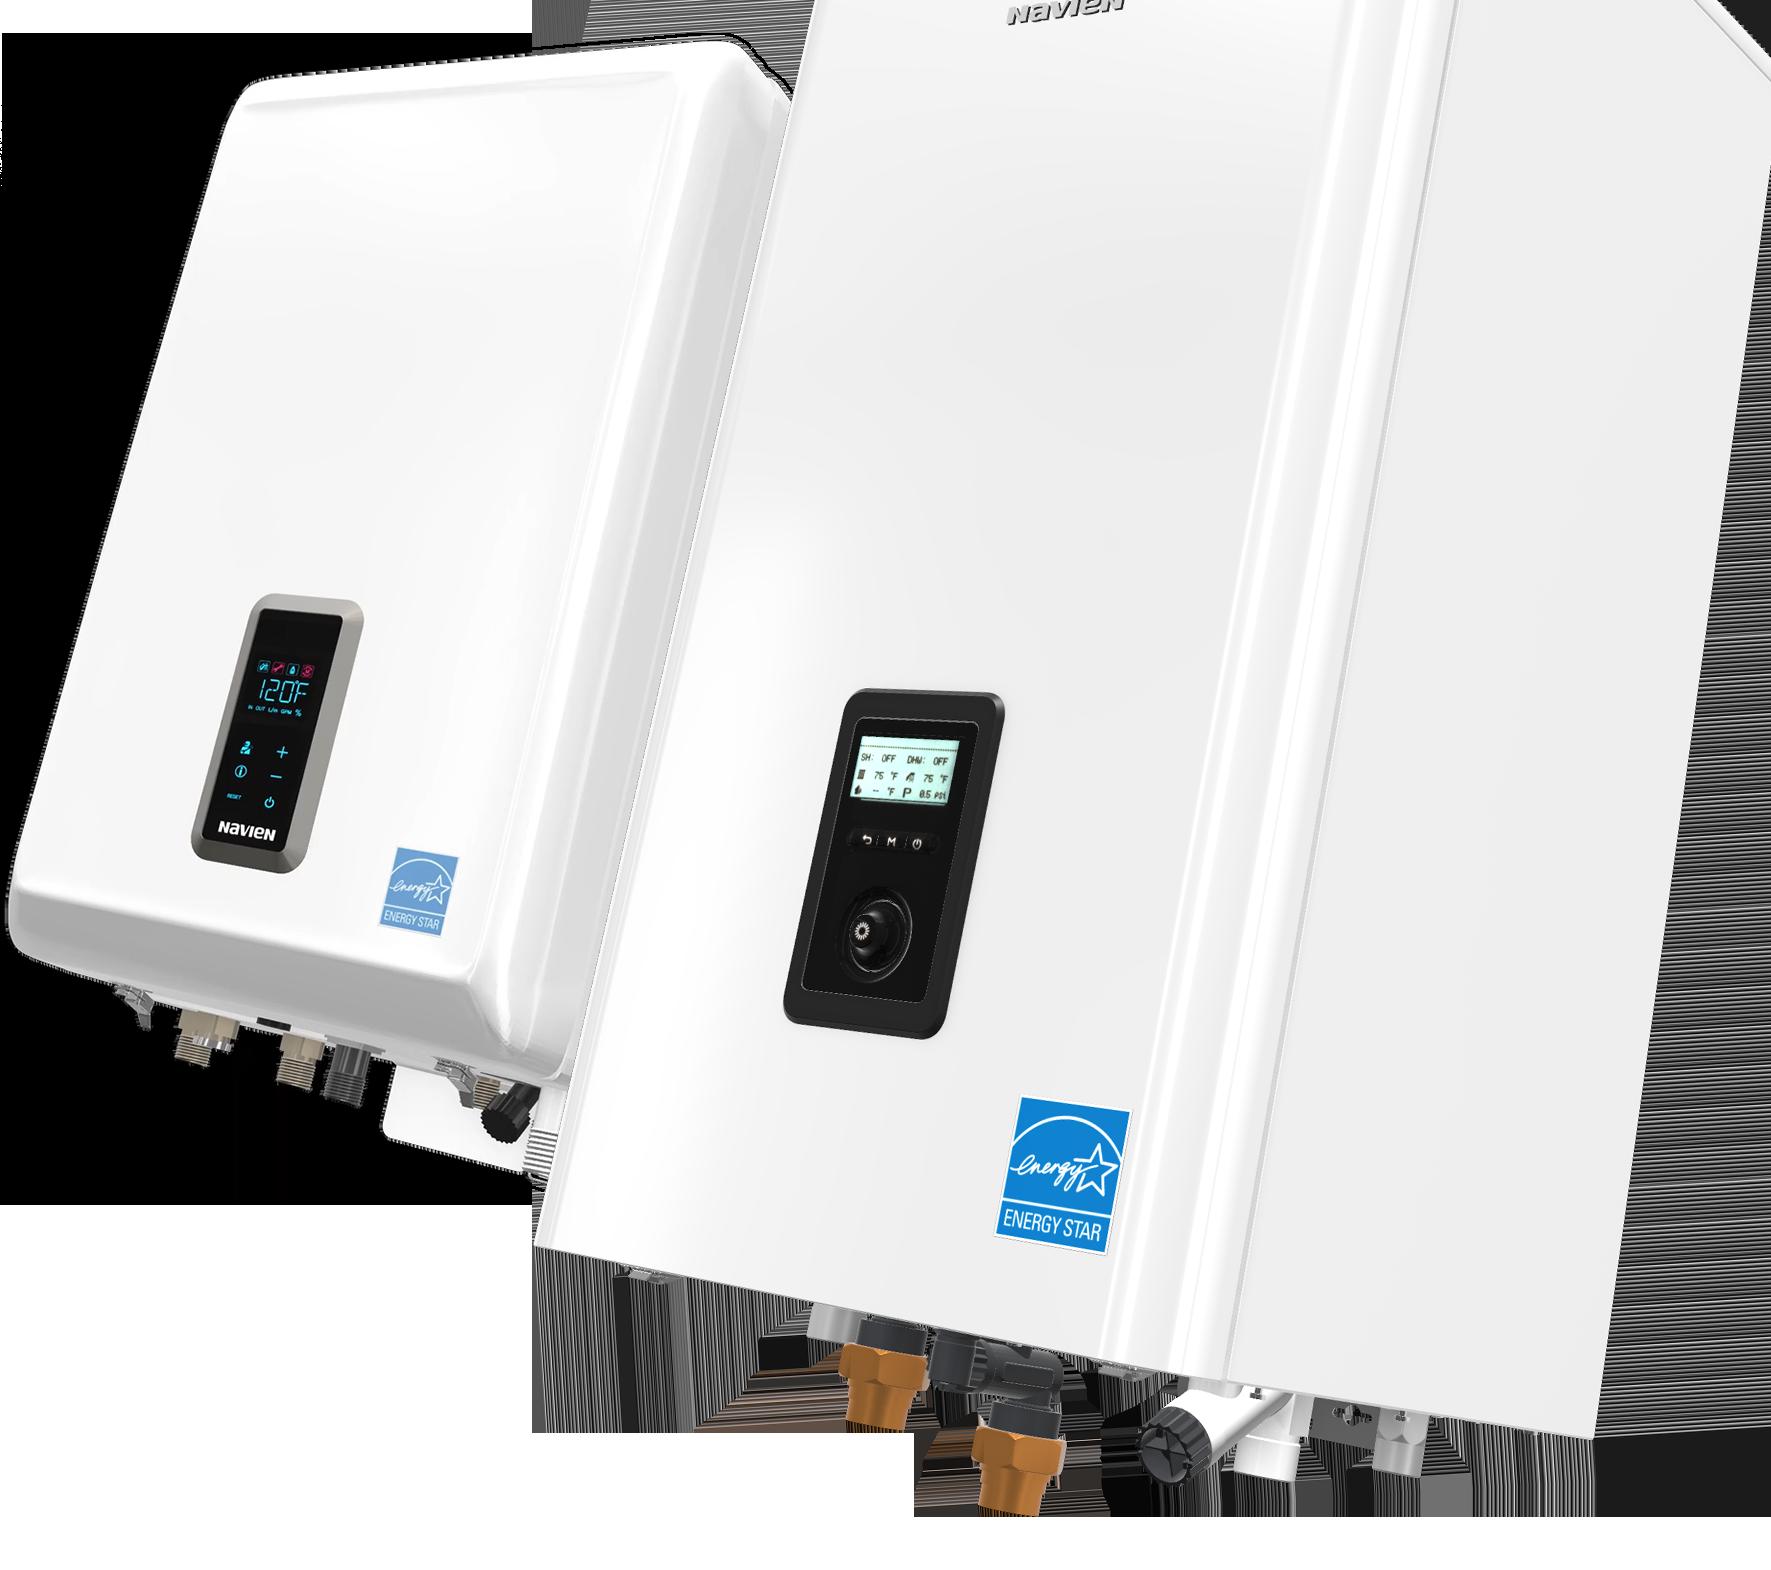 Combi-Boilers | Residential | Navien on oil boiler wiring diagram, residential boiler wiring diagram, burnham boiler wiring diagram, weil mclain boiler wiring diagram,